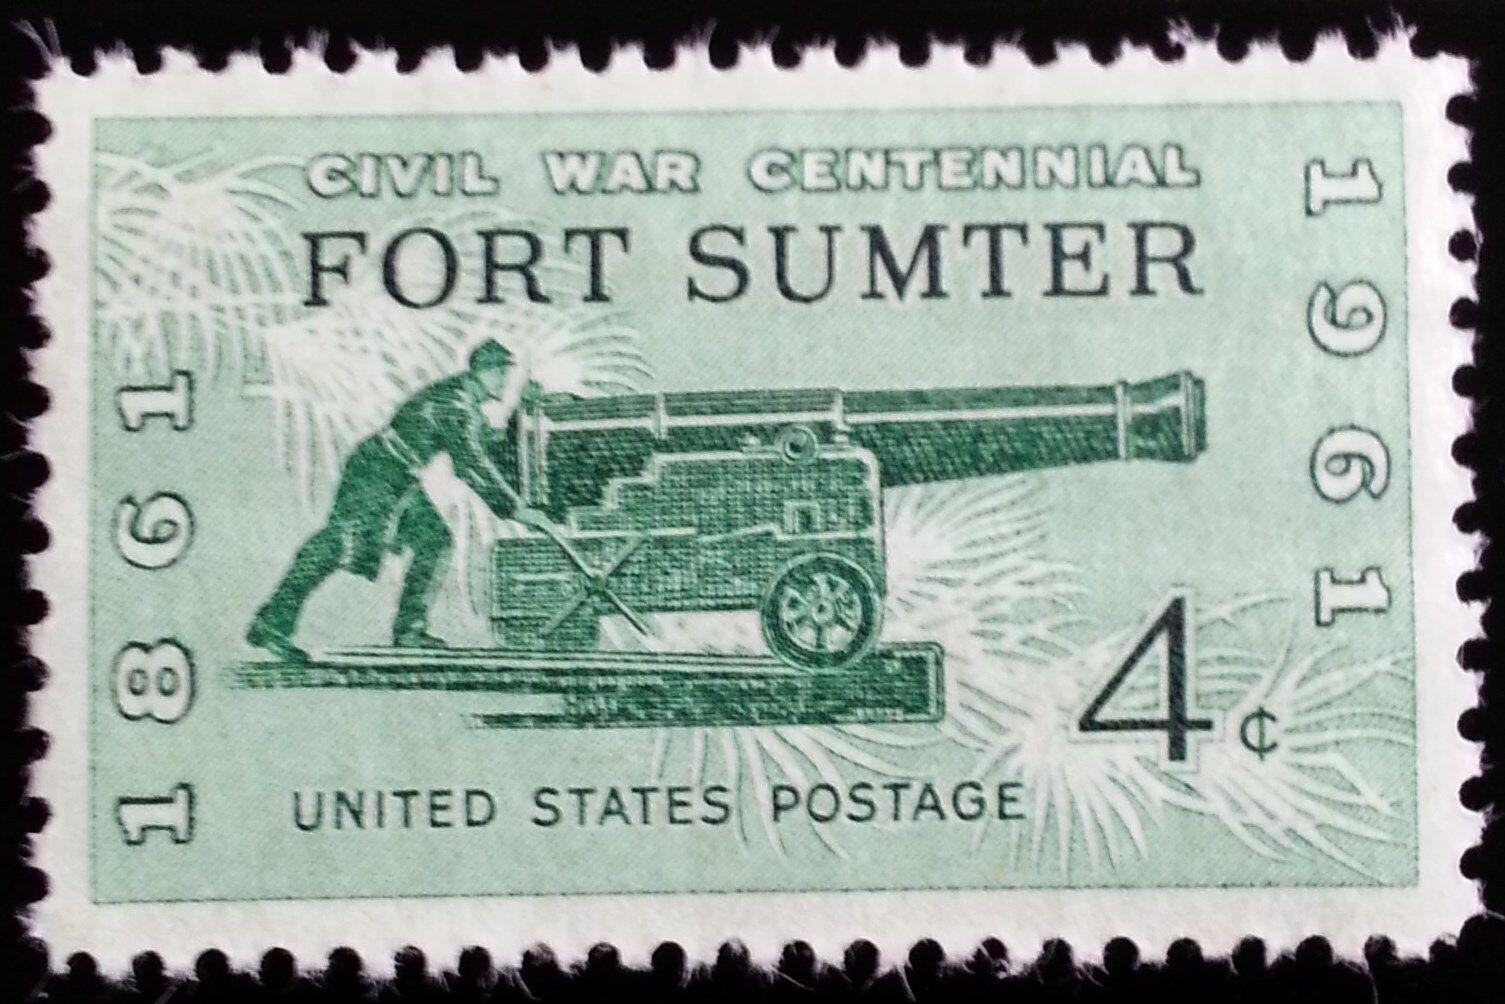 1961 4c Fort Sumter, Civil War, 100th Anniversary Scott